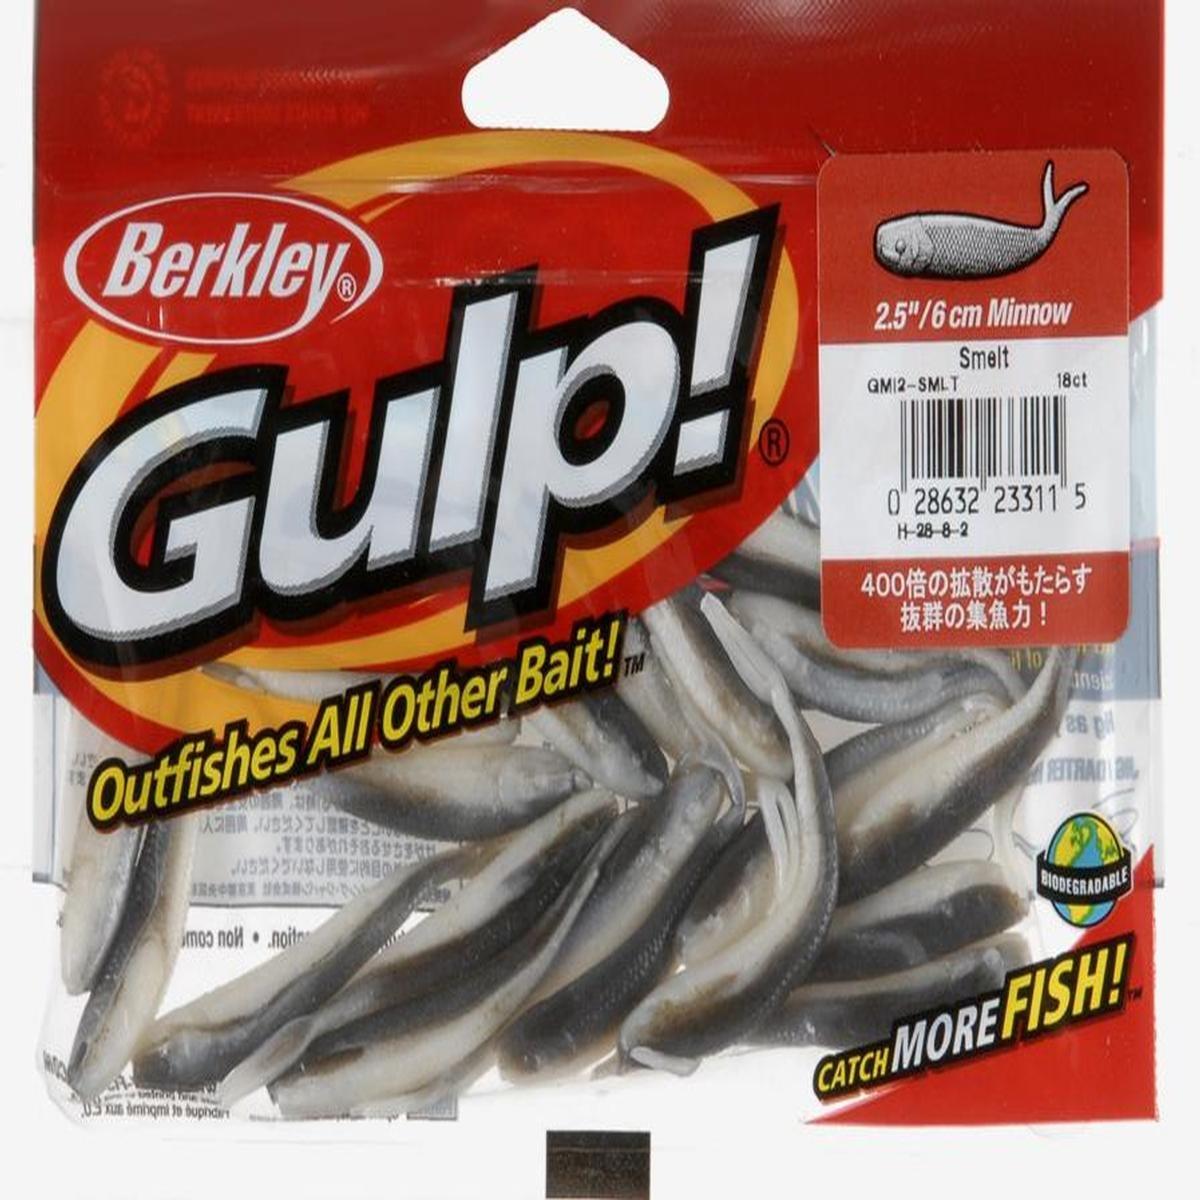 18 - Pk. Berkley Gulp! 2 1/2 pollici Pesciolini, Chartreuse Shad GMI2-CS